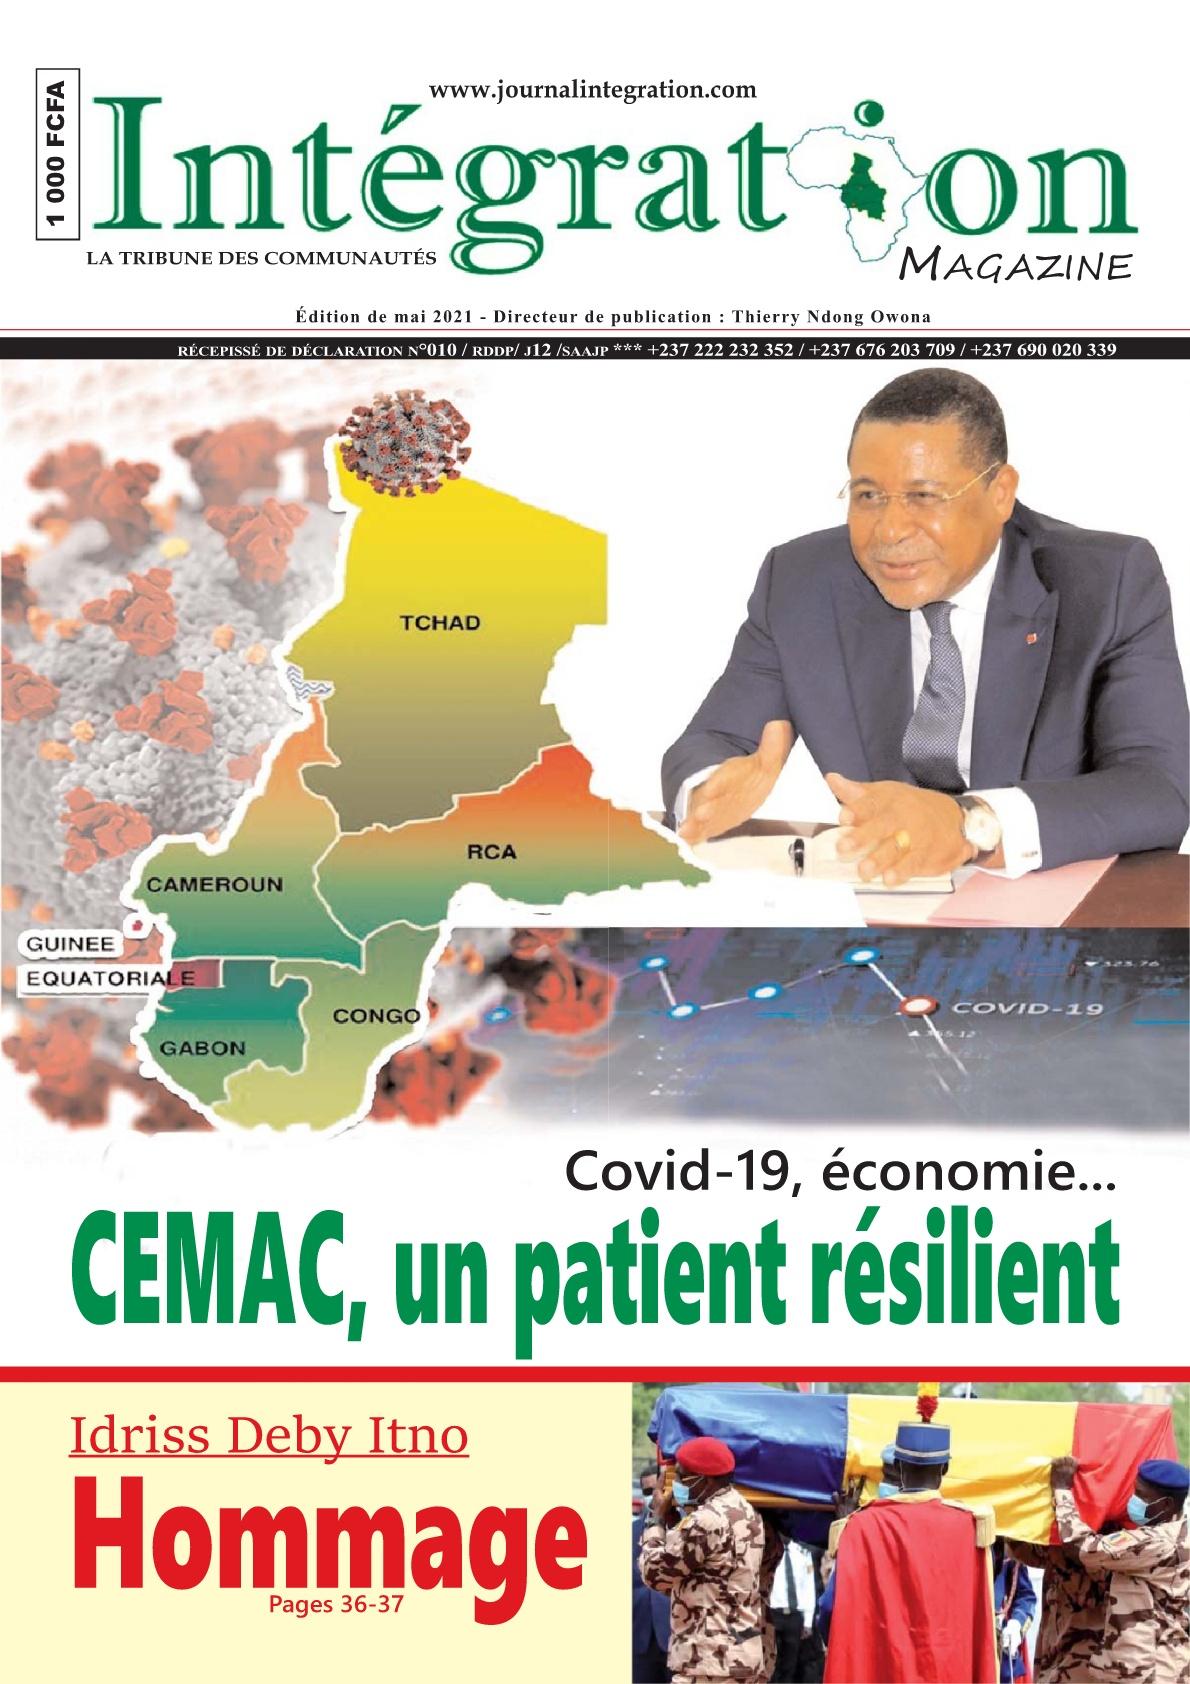 Intégration magazine - 18/05/2021